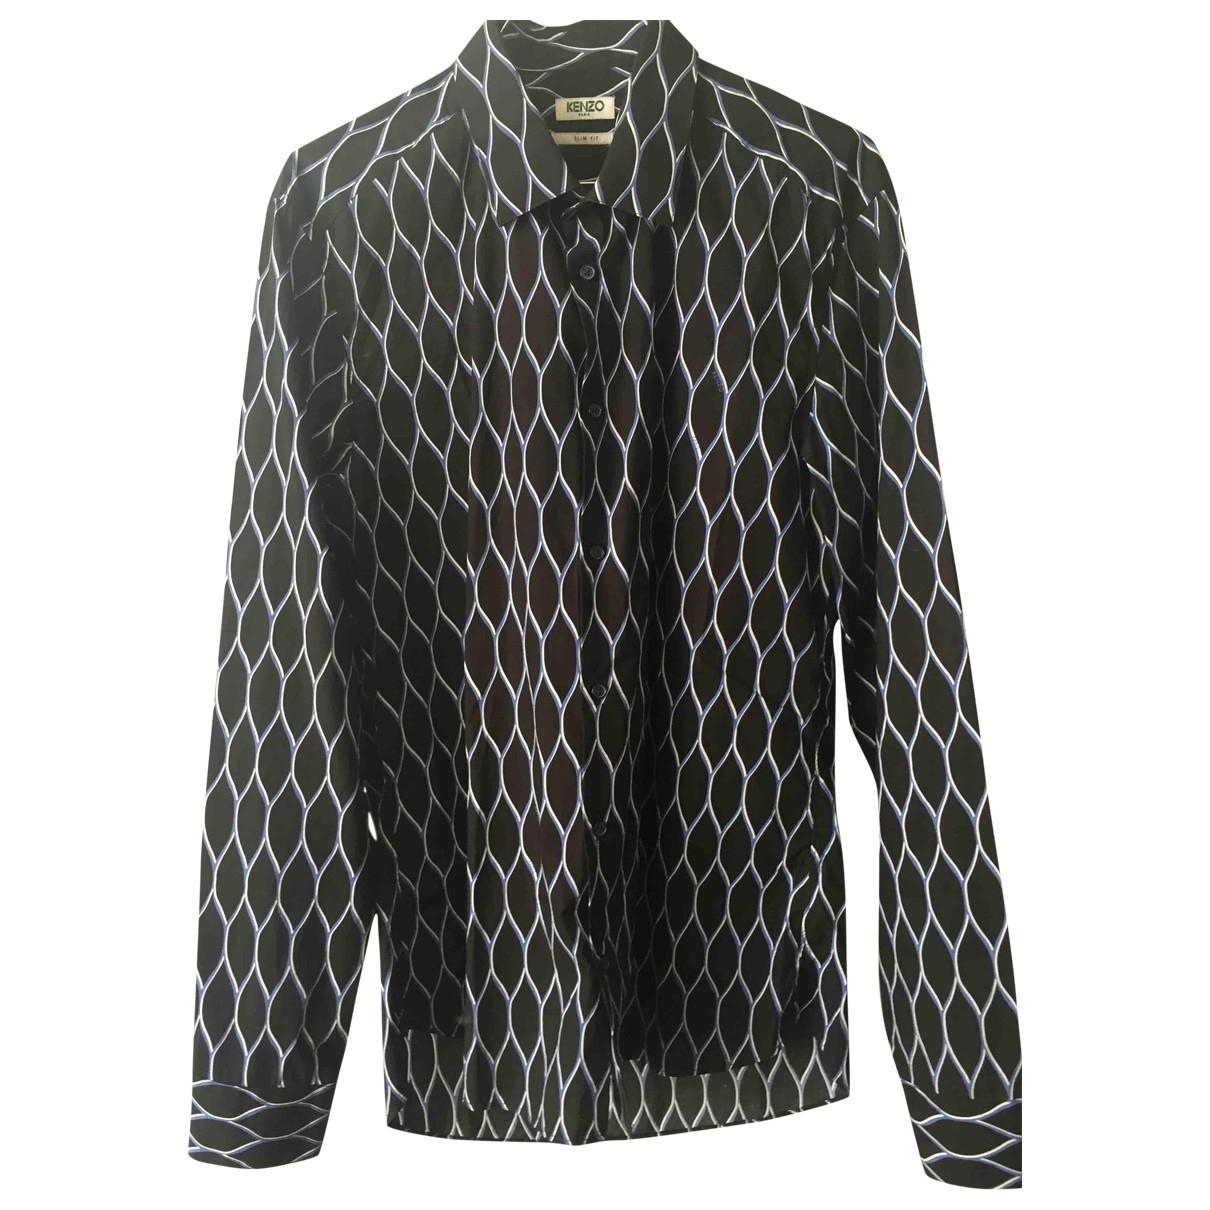 Kenzo \N Black Cotton Shirts for Men 40 EU (tour de cou / collar)